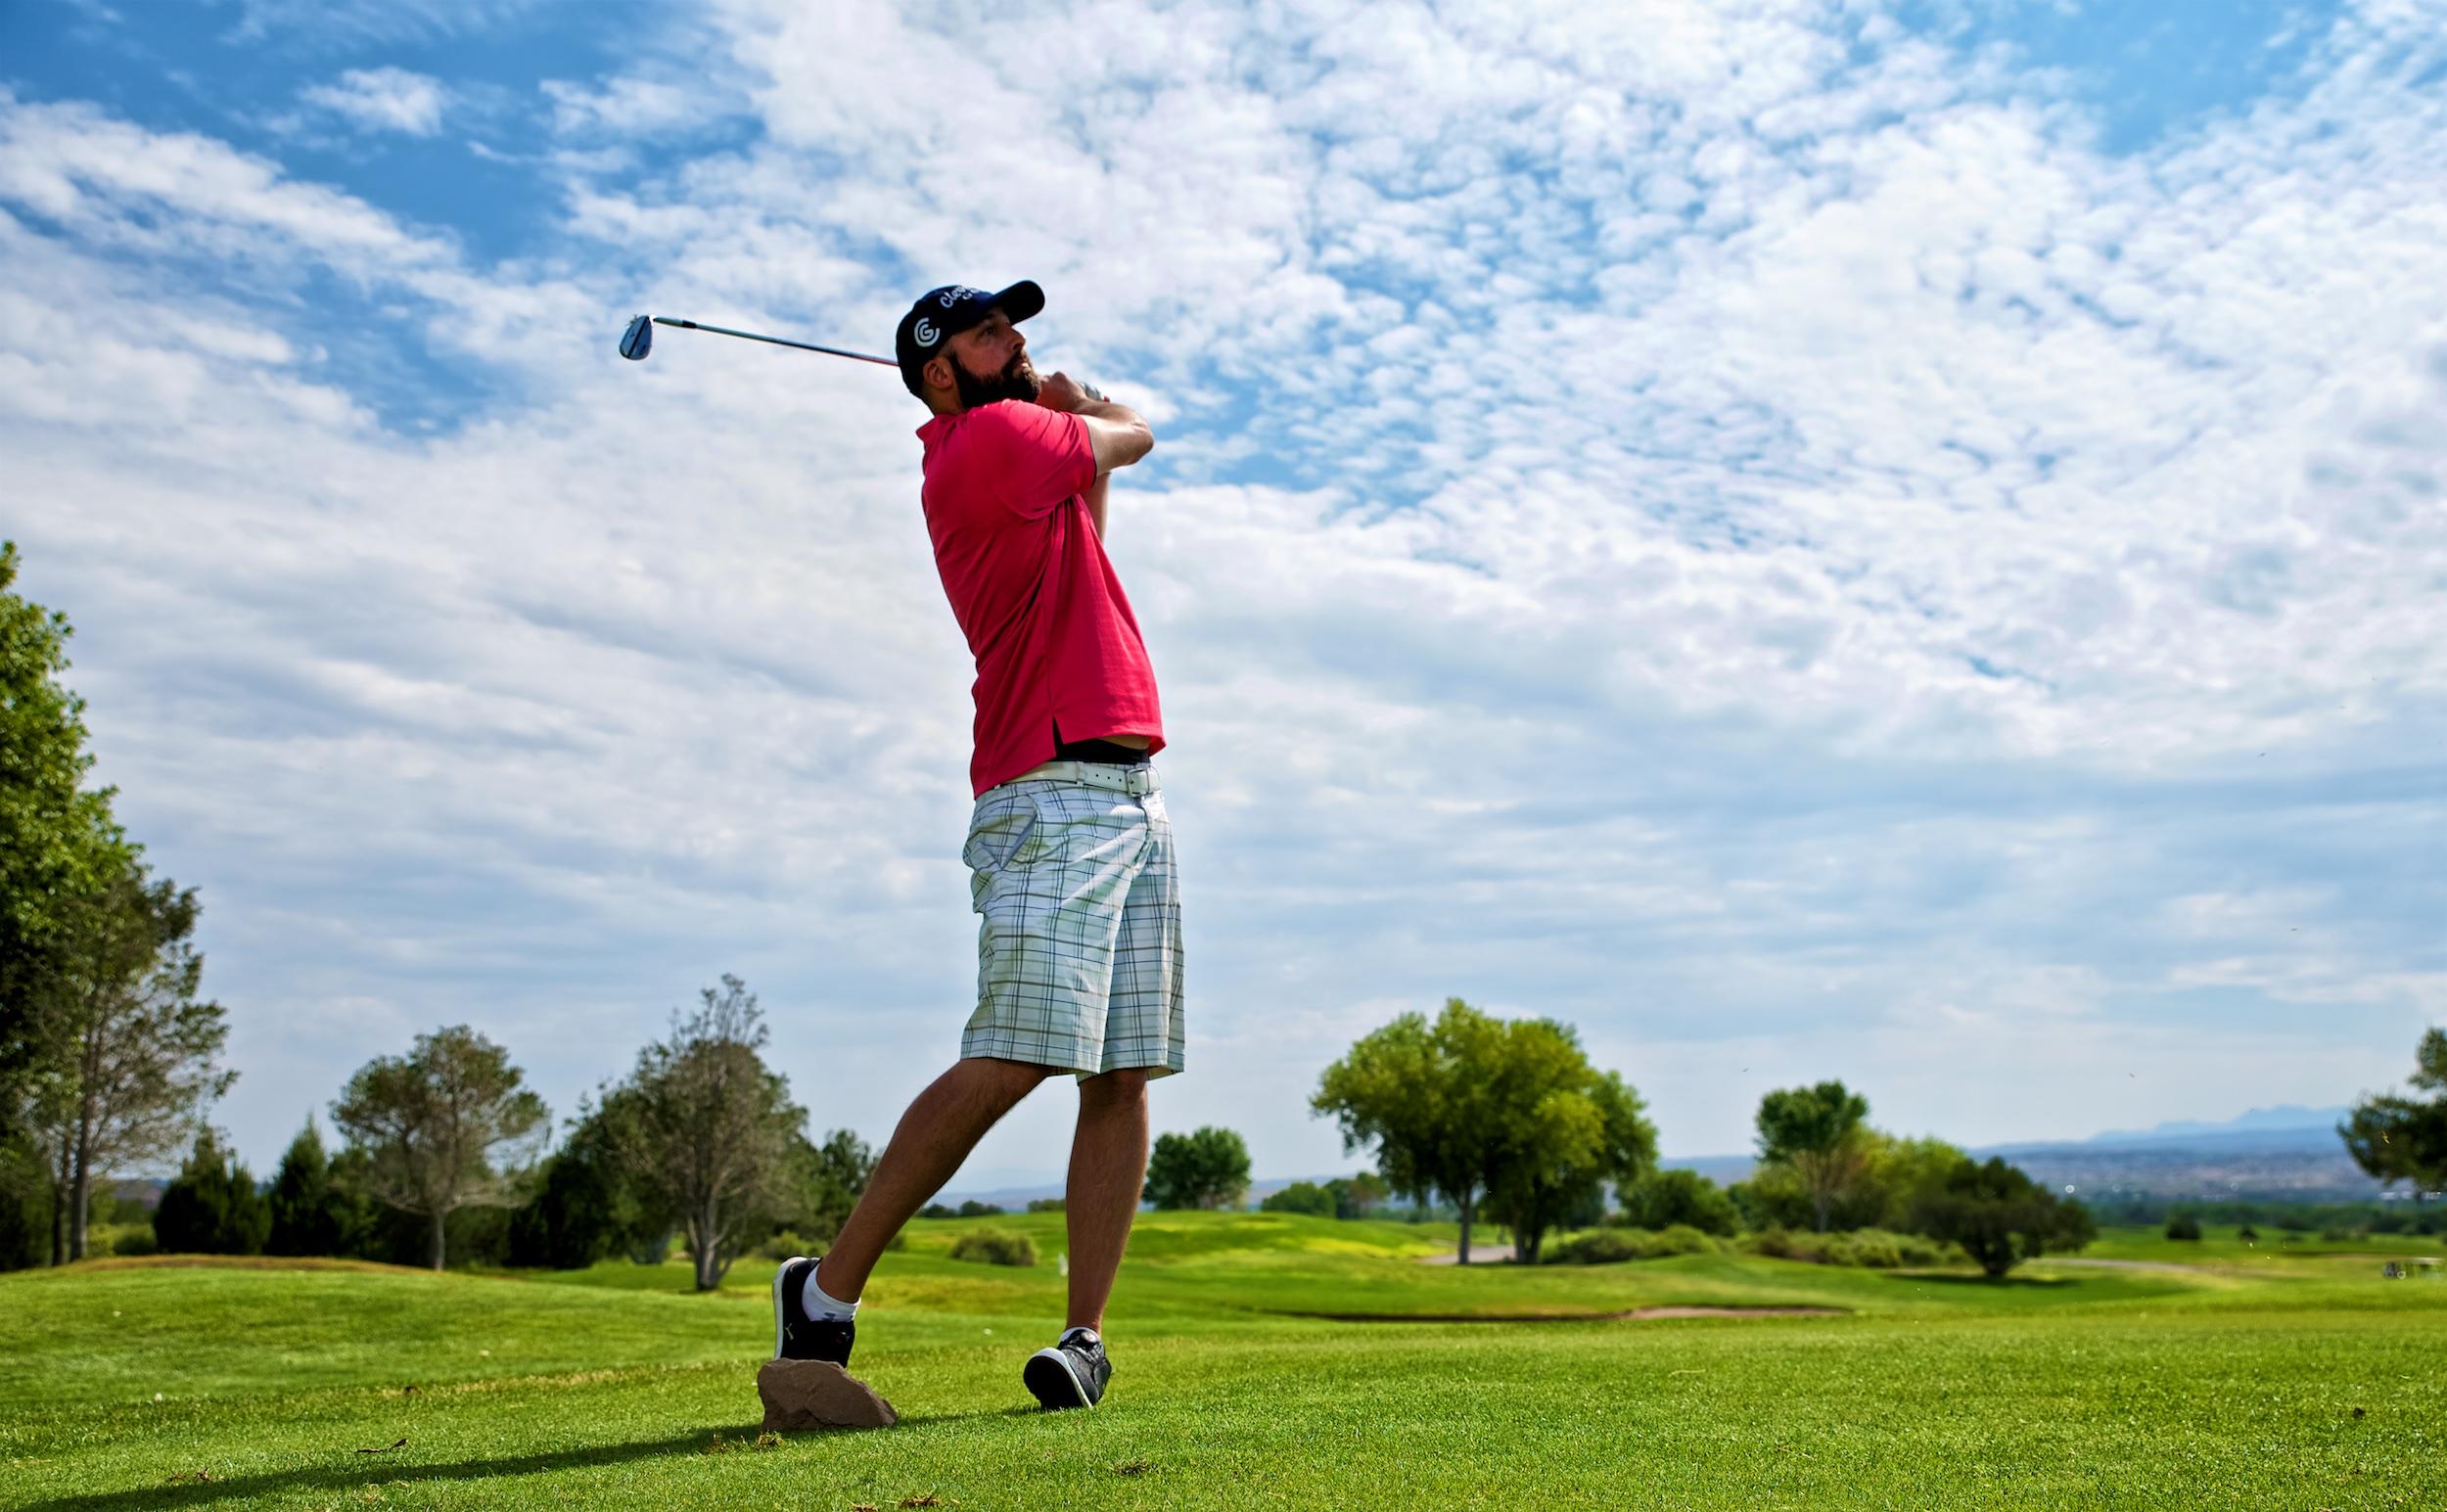 ahcc-8-16-2018-golf-100519.jpg